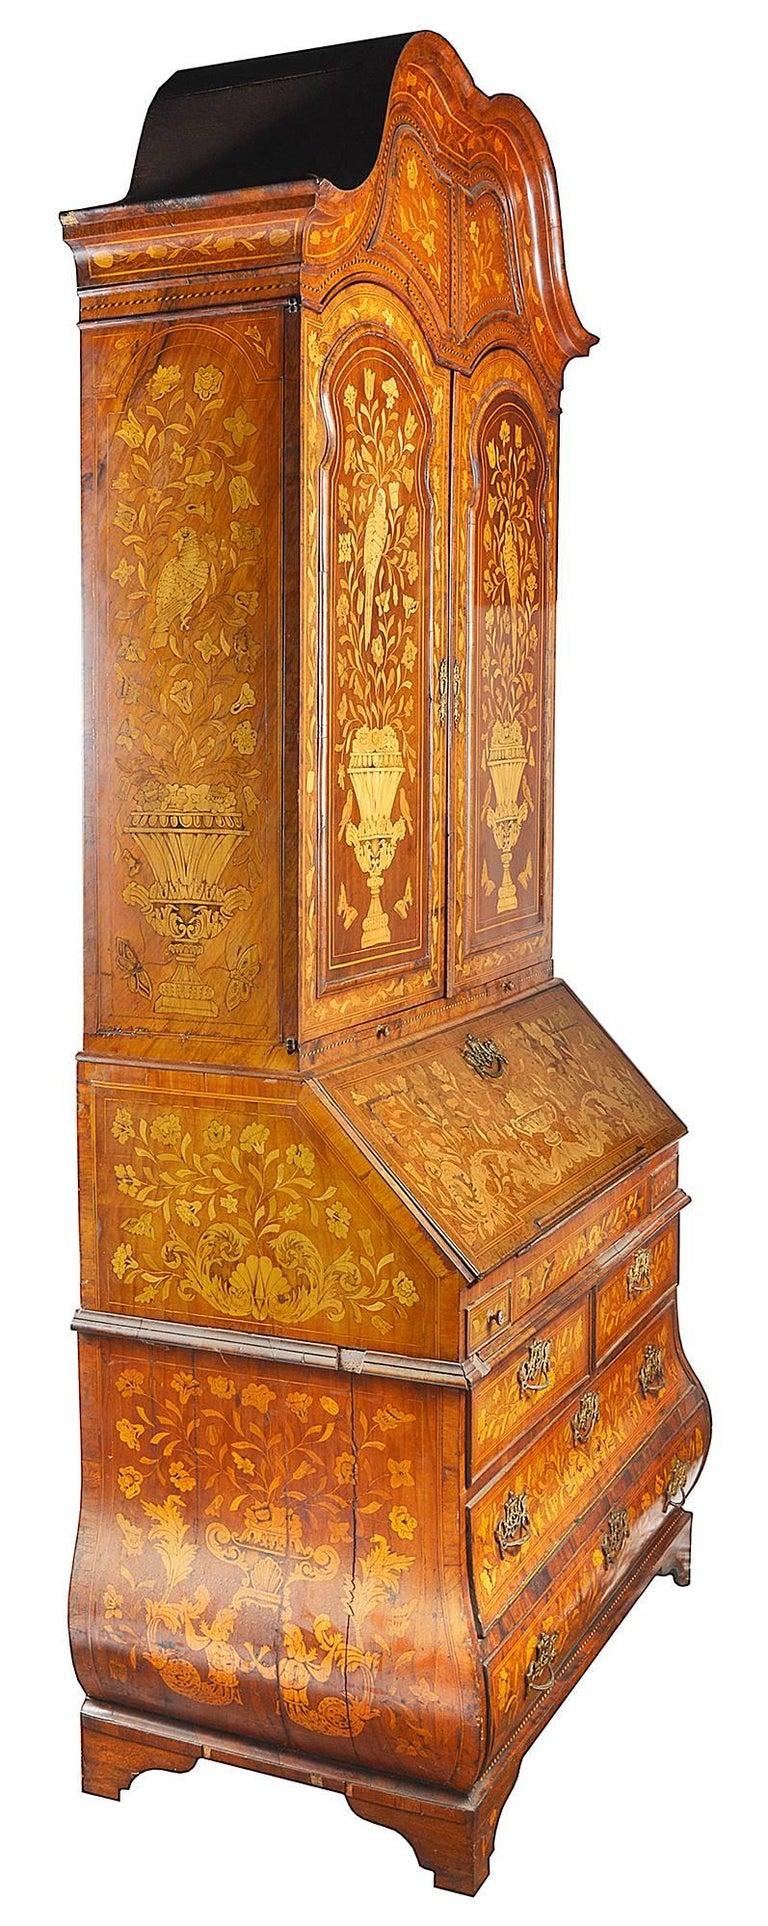 Dutch Colonial 18th Century Dutch Marquetry Bureau Bookcase For Sale